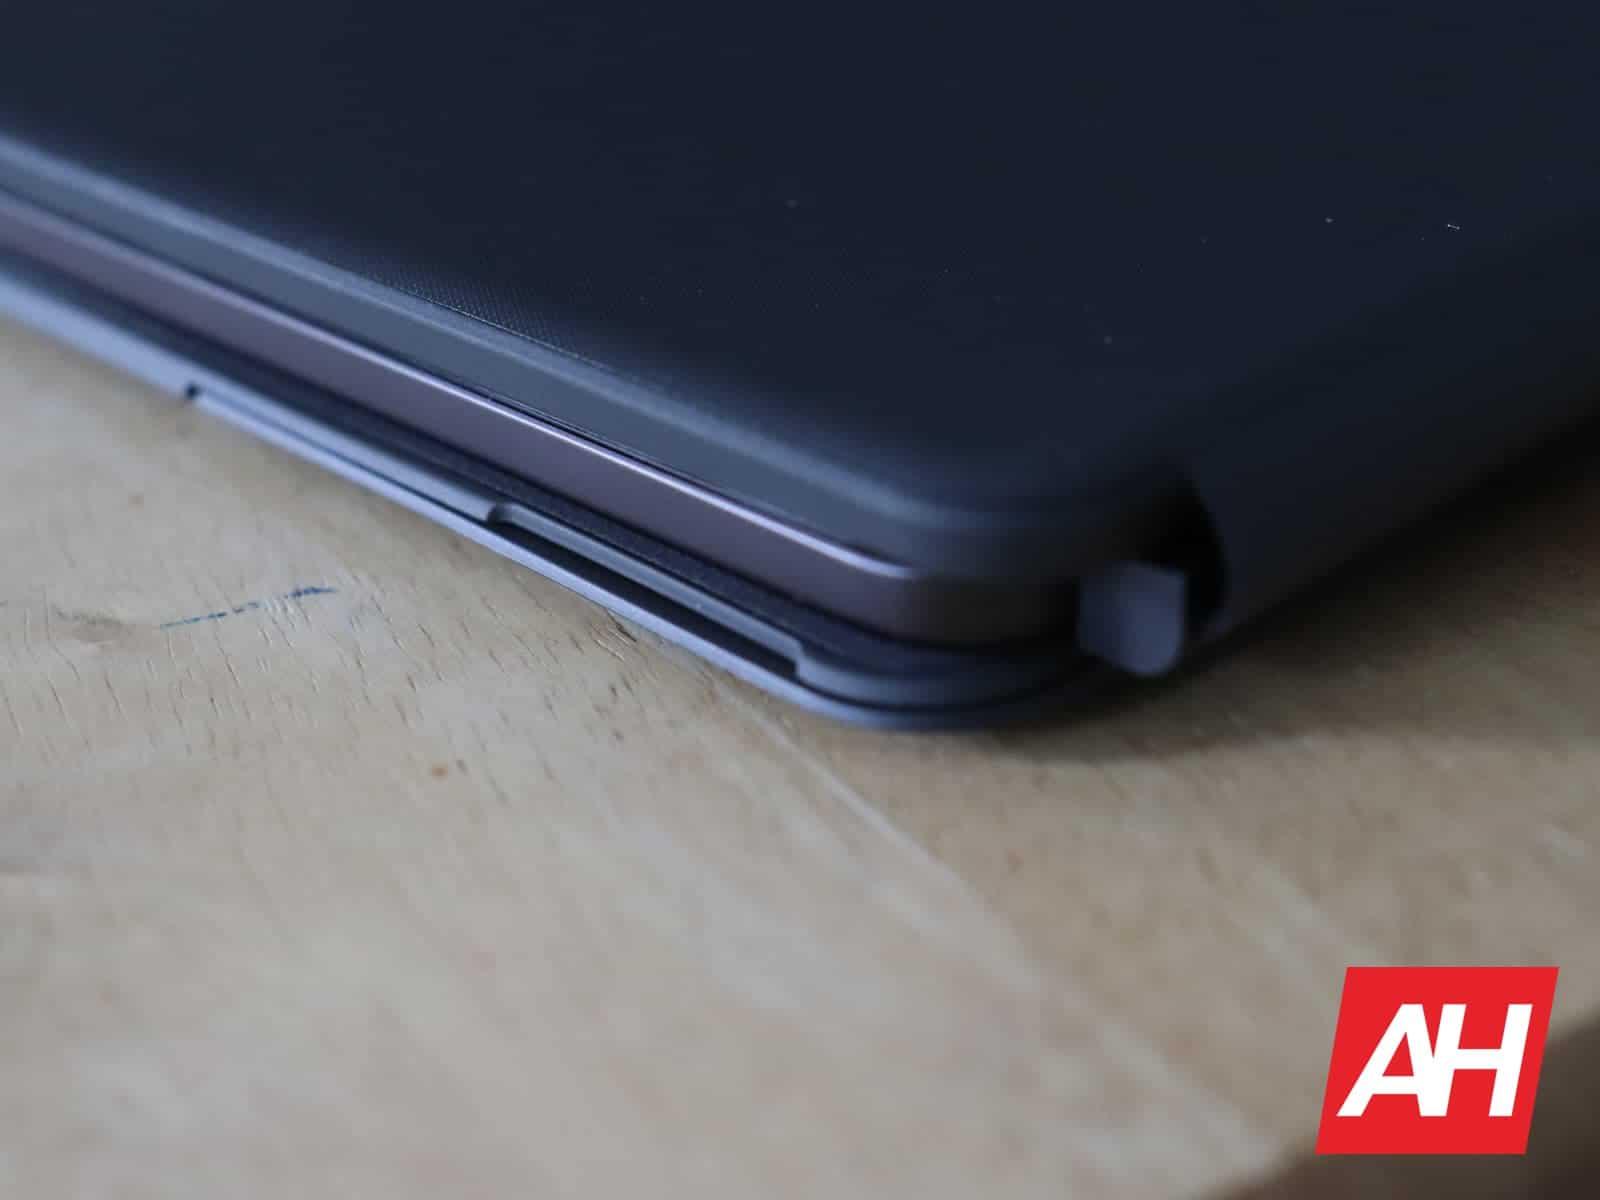 03 7 Lenovo IdeaPad Duet Hardware AH 2020